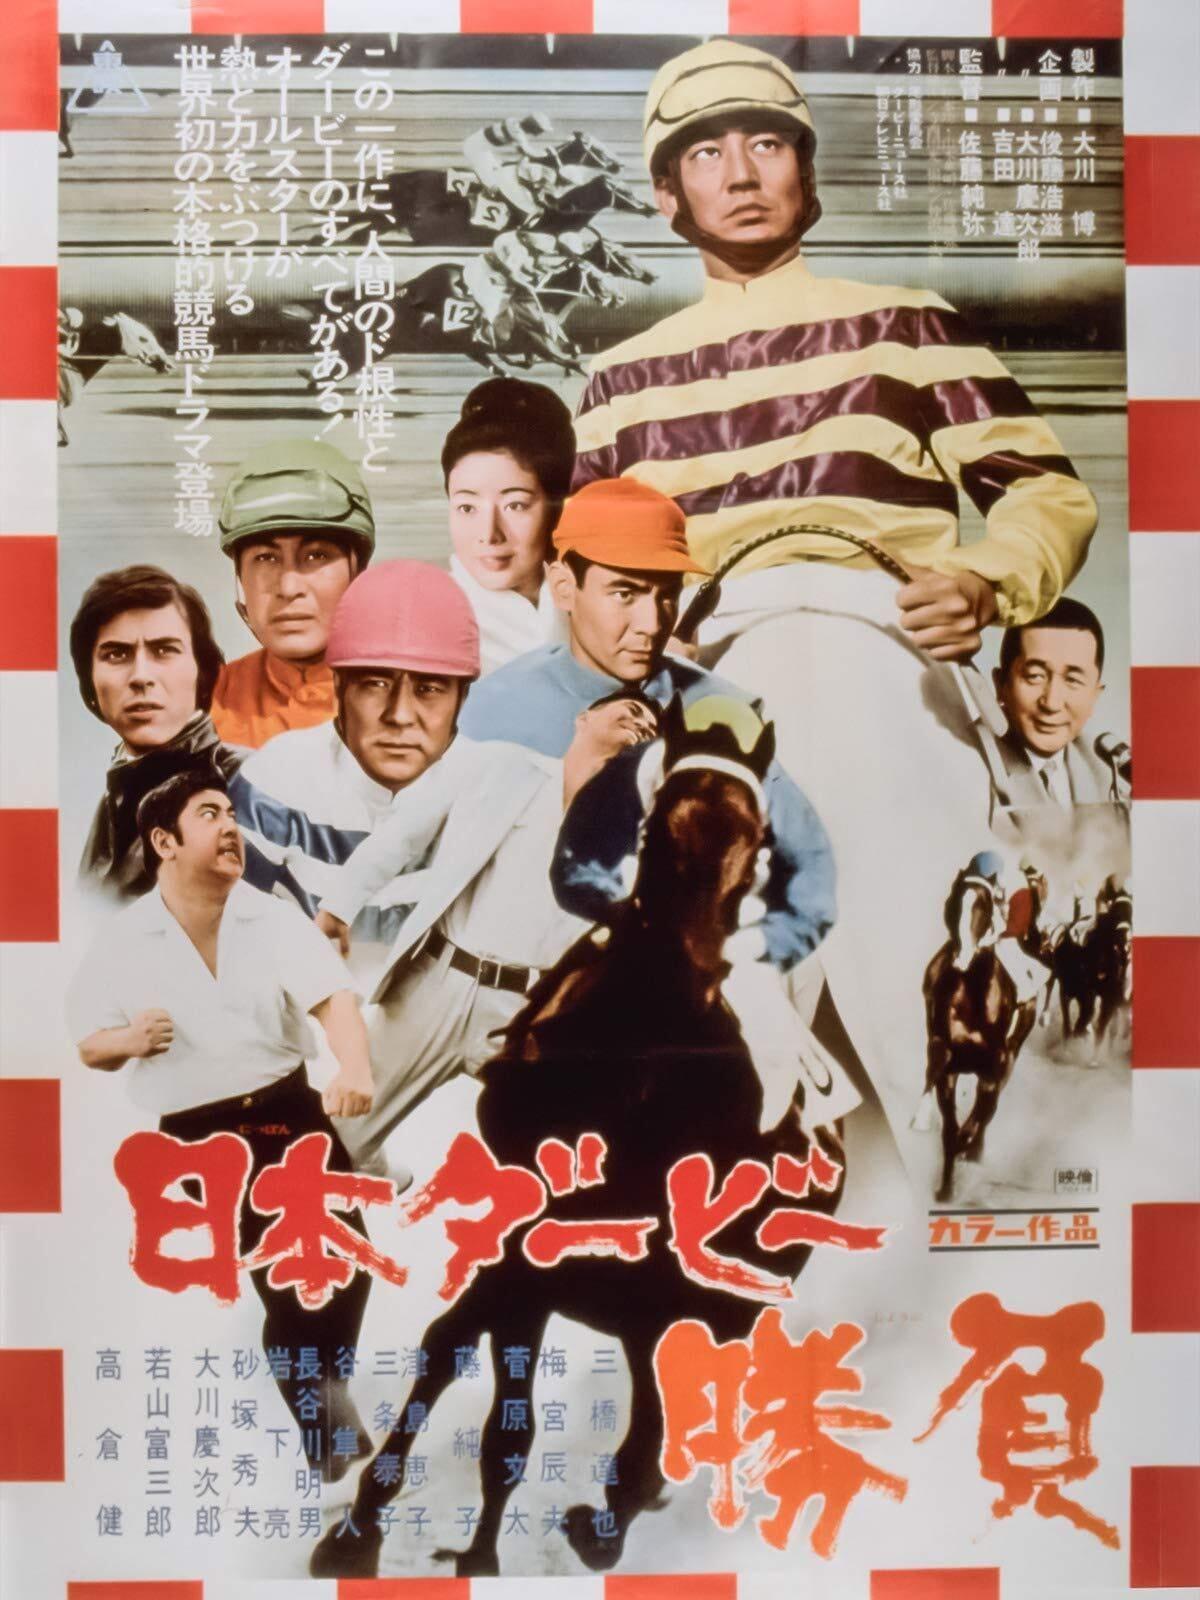 The Japan Derby Race